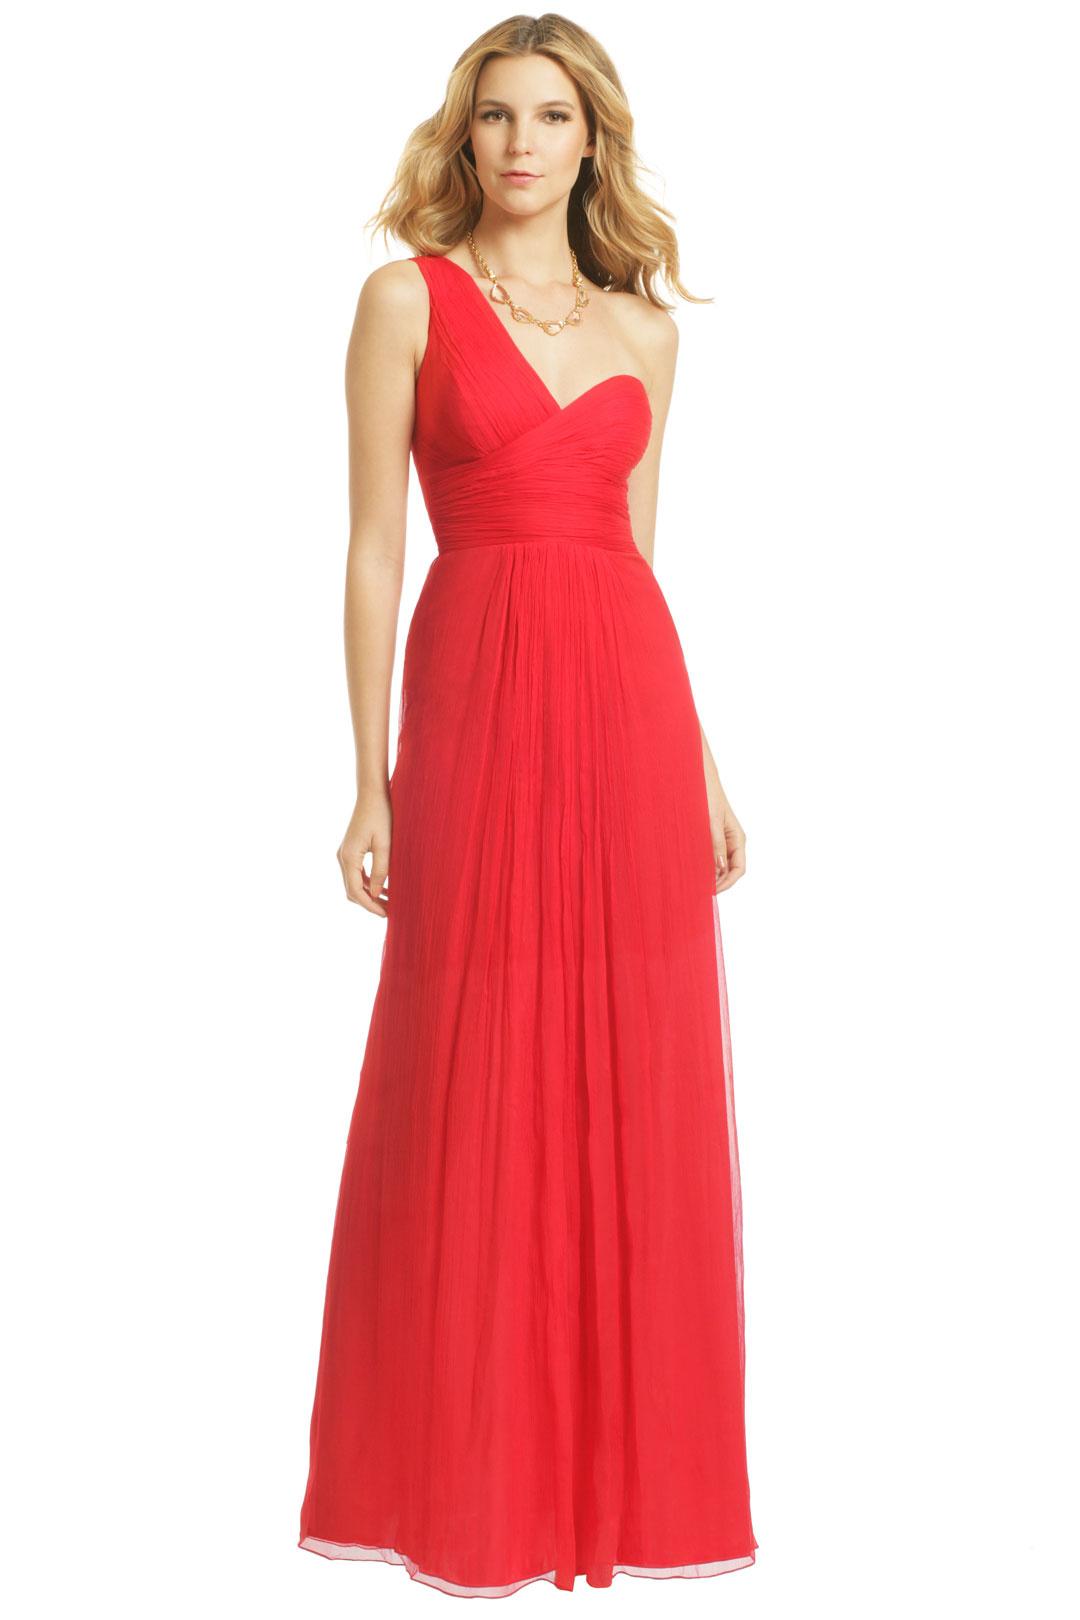 Carlos miele vermelho olinda gown